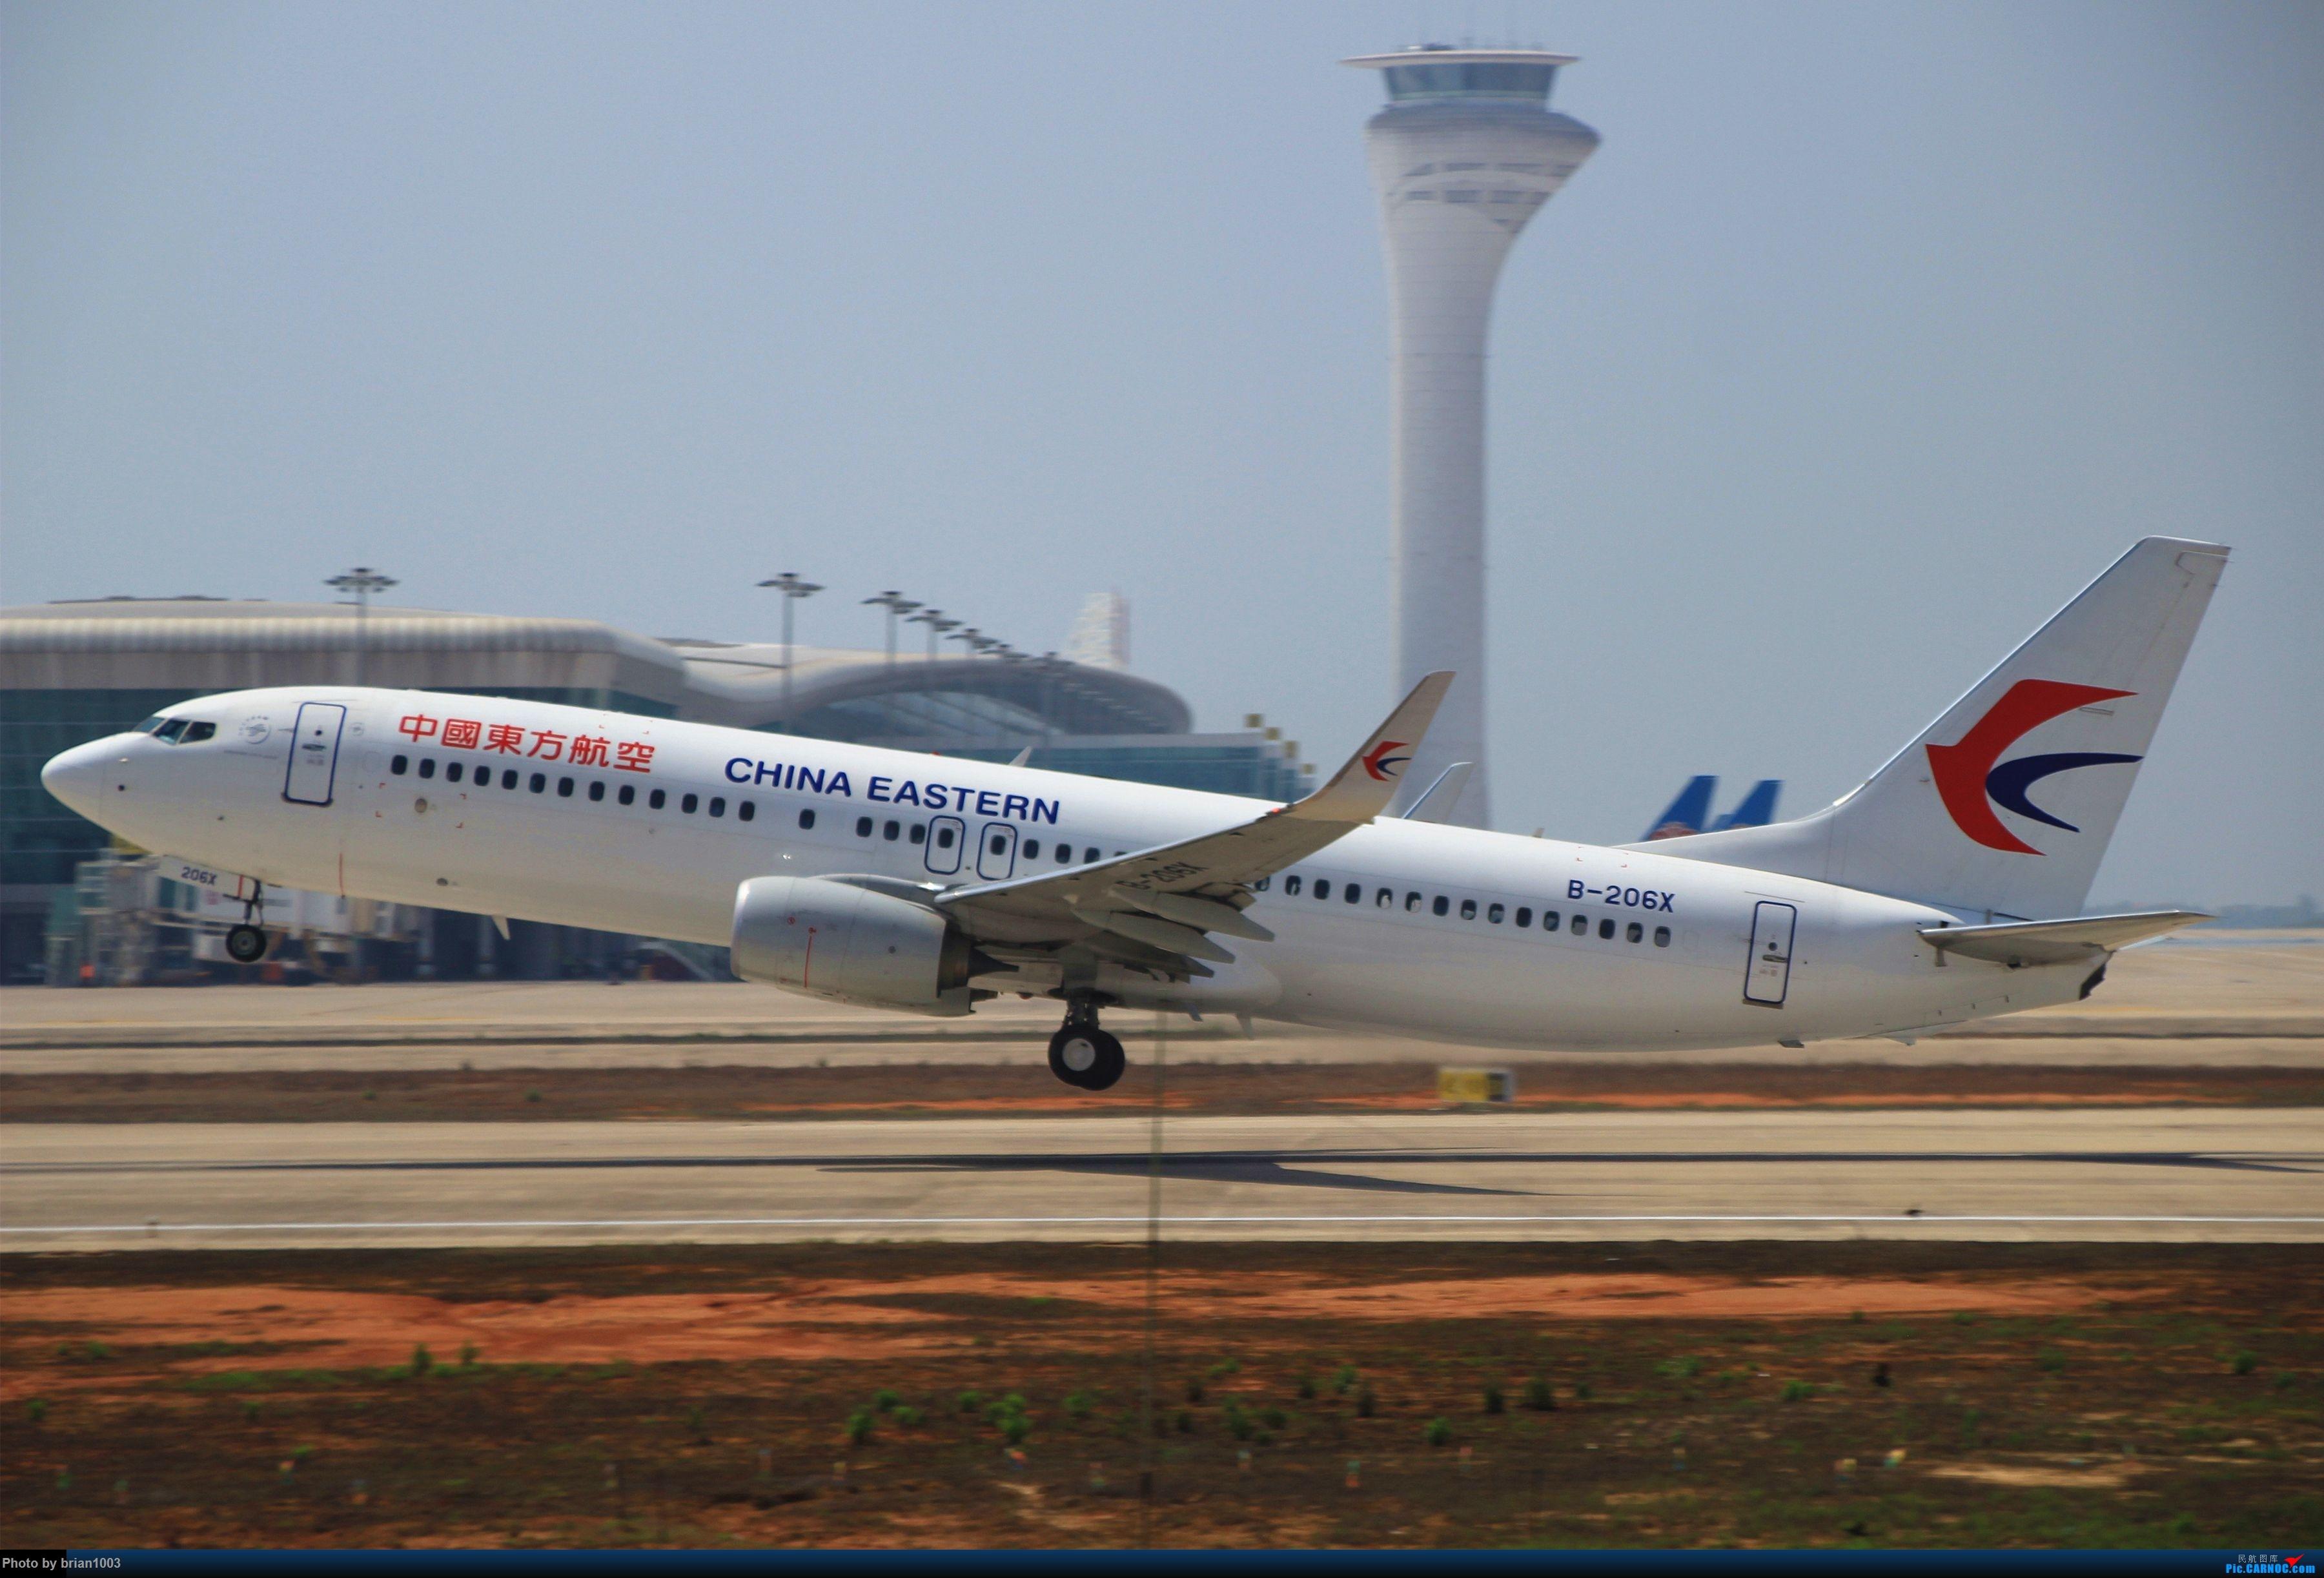 Re:[原创]WUH武汉天河机场拍机之喜迎酷航788和偶遇某其他飞机 BOEING 737-800 B-206X